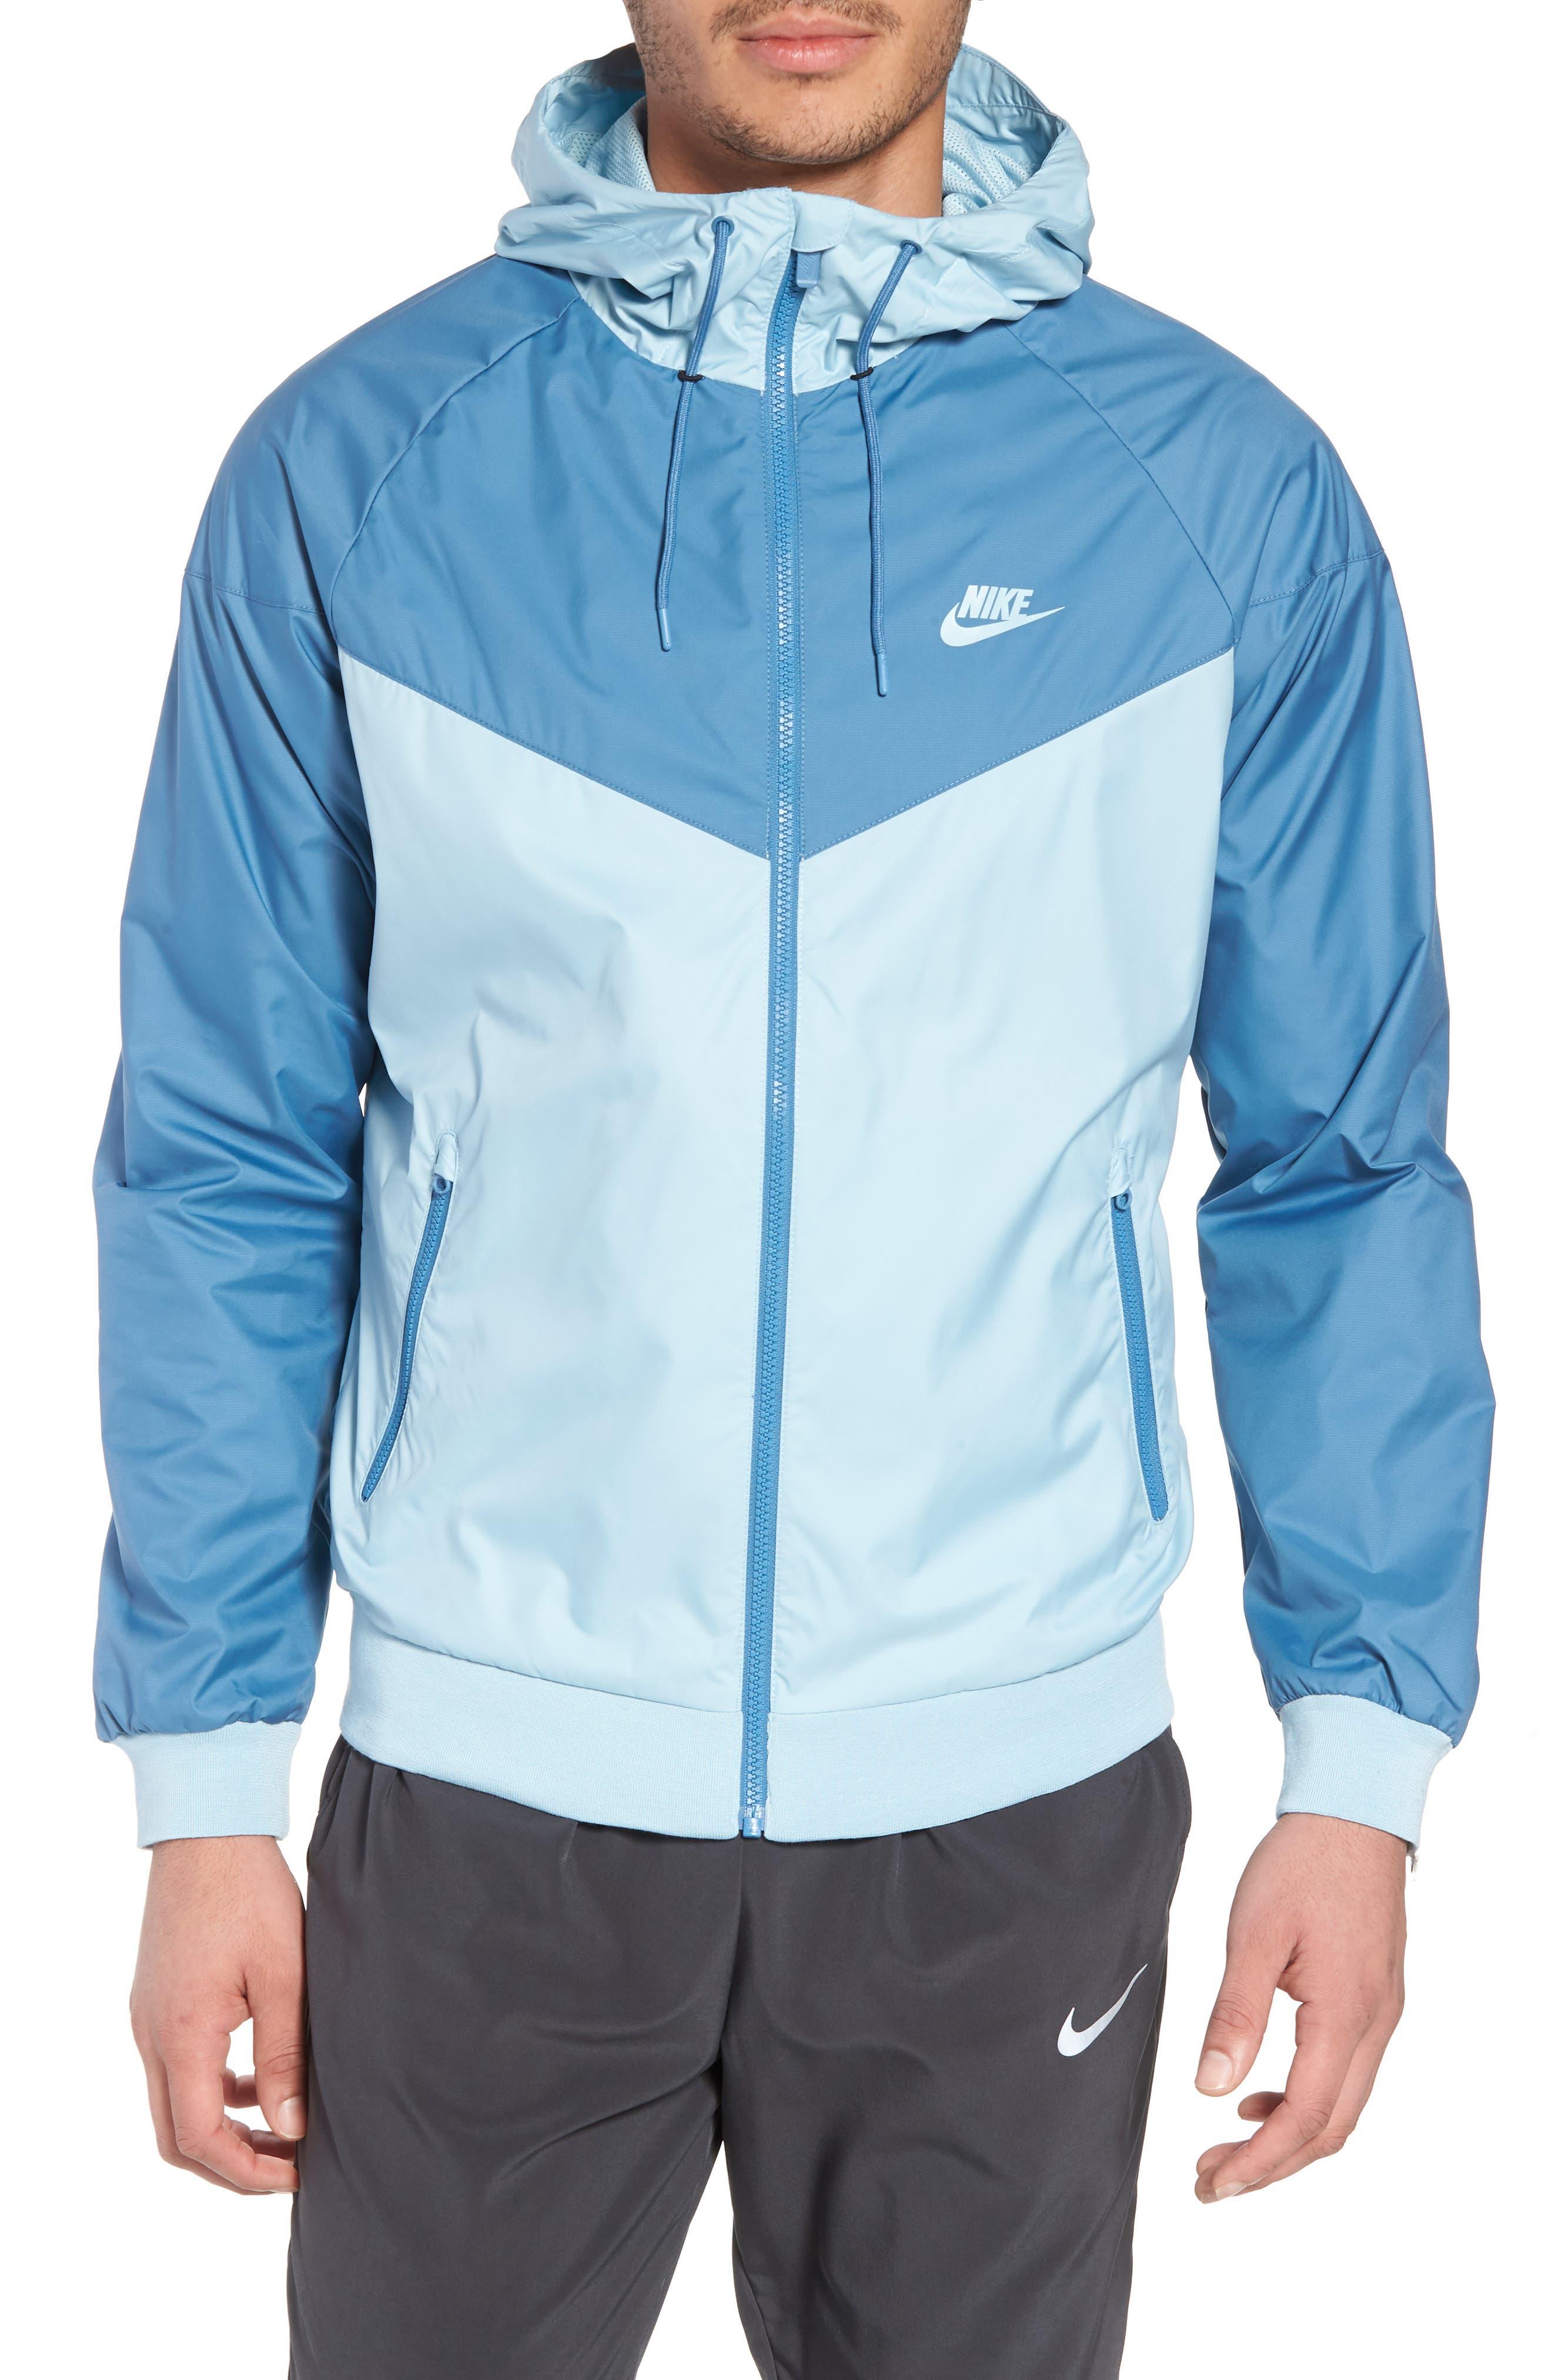 NIKE Windrunner Colorblock Jacket, Main, color, OCEAN BLISS/ AEGEAN STORM